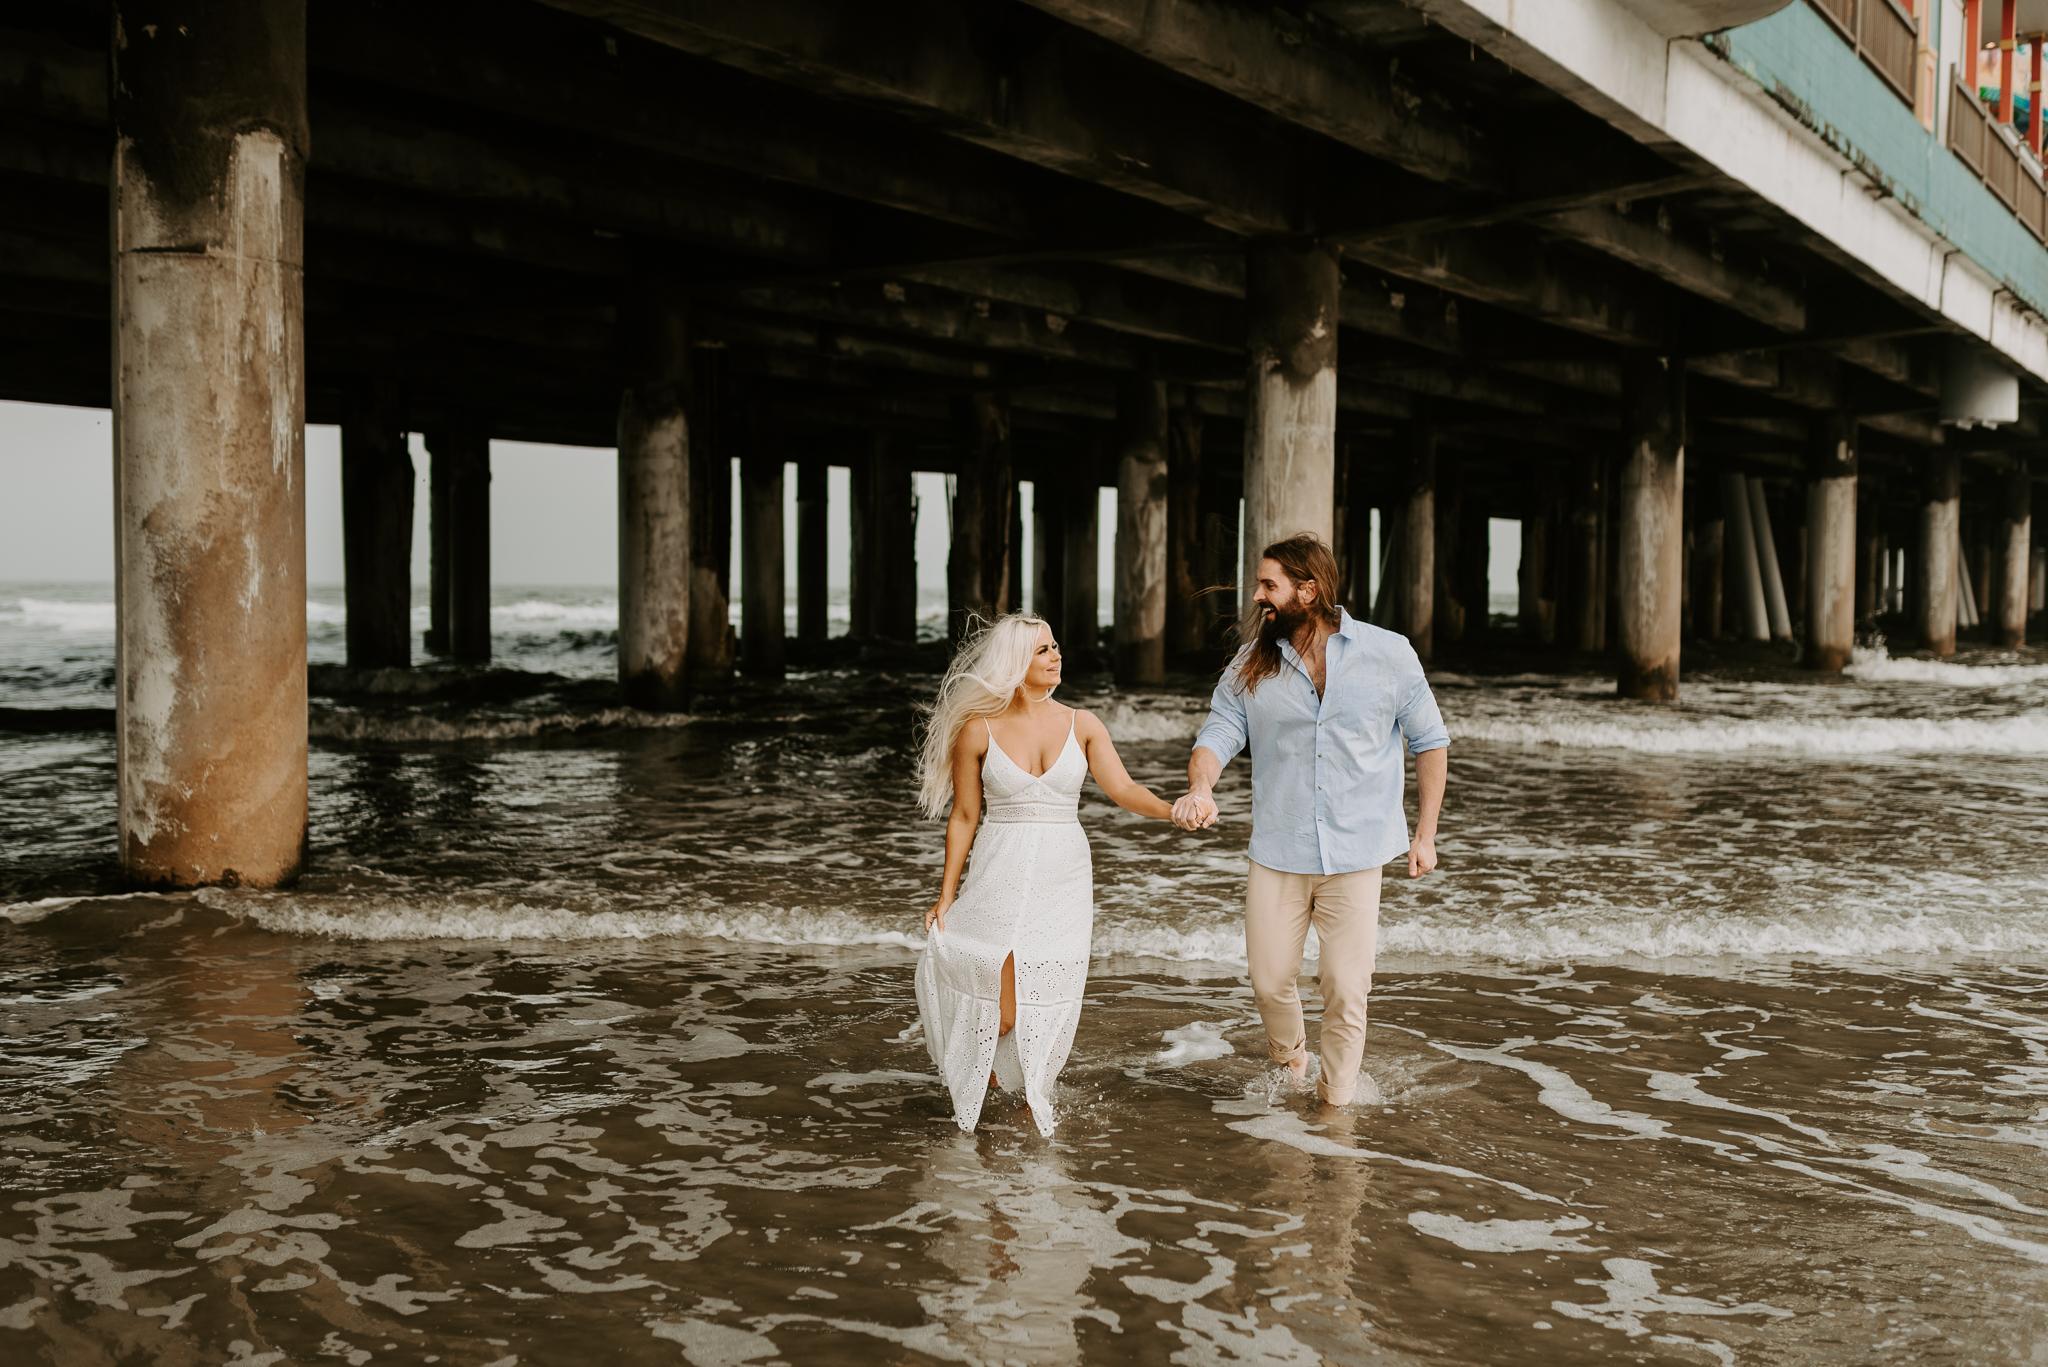 Ashley + Charles - Galveston Texas Moody Engagement Session | Kristen Giles Photography - 015.jpg